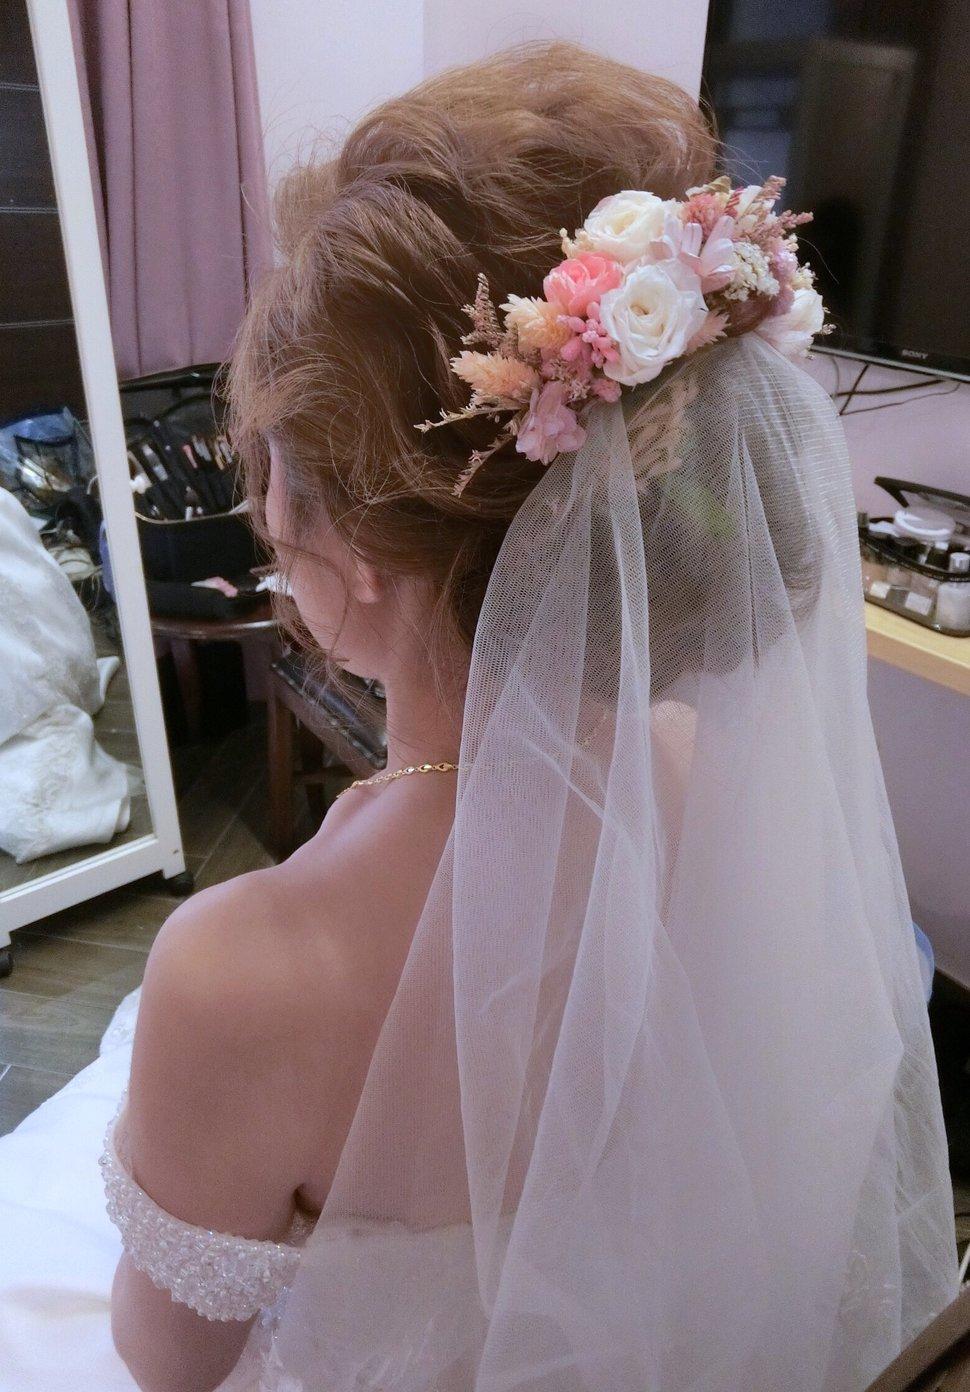 54F614AA-B01D-476D-A737-AA5CFBFDE36D - 林卉卉新娘秘書/全省新祕 - 結婚吧